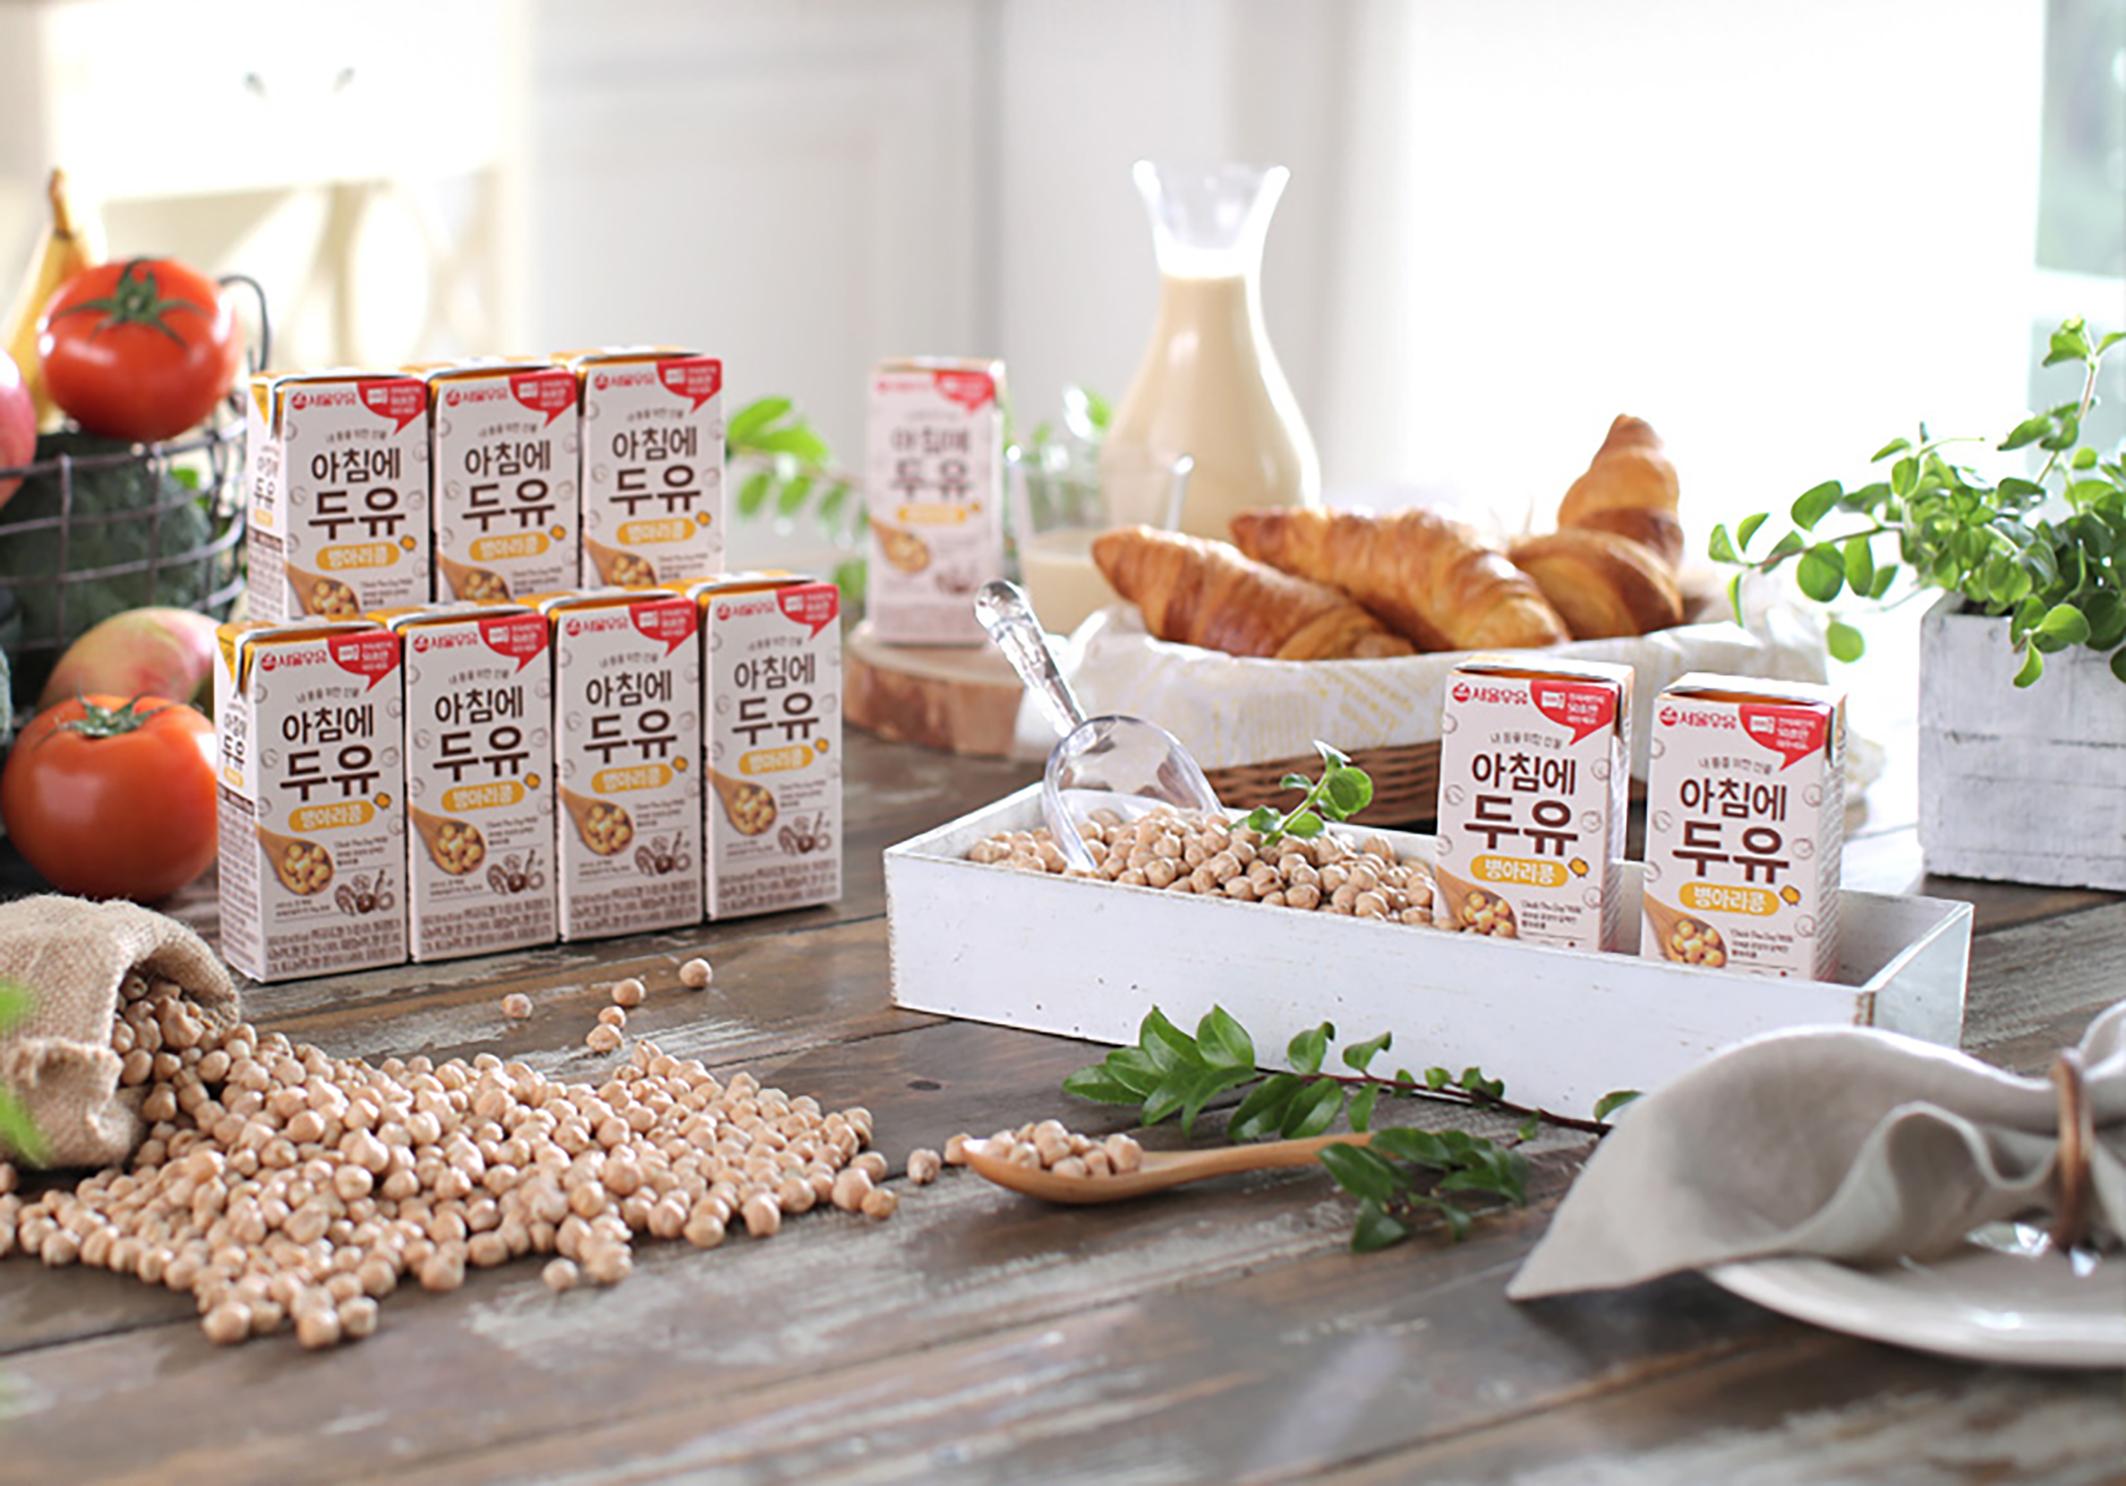 Microwaveability solution to carton packs